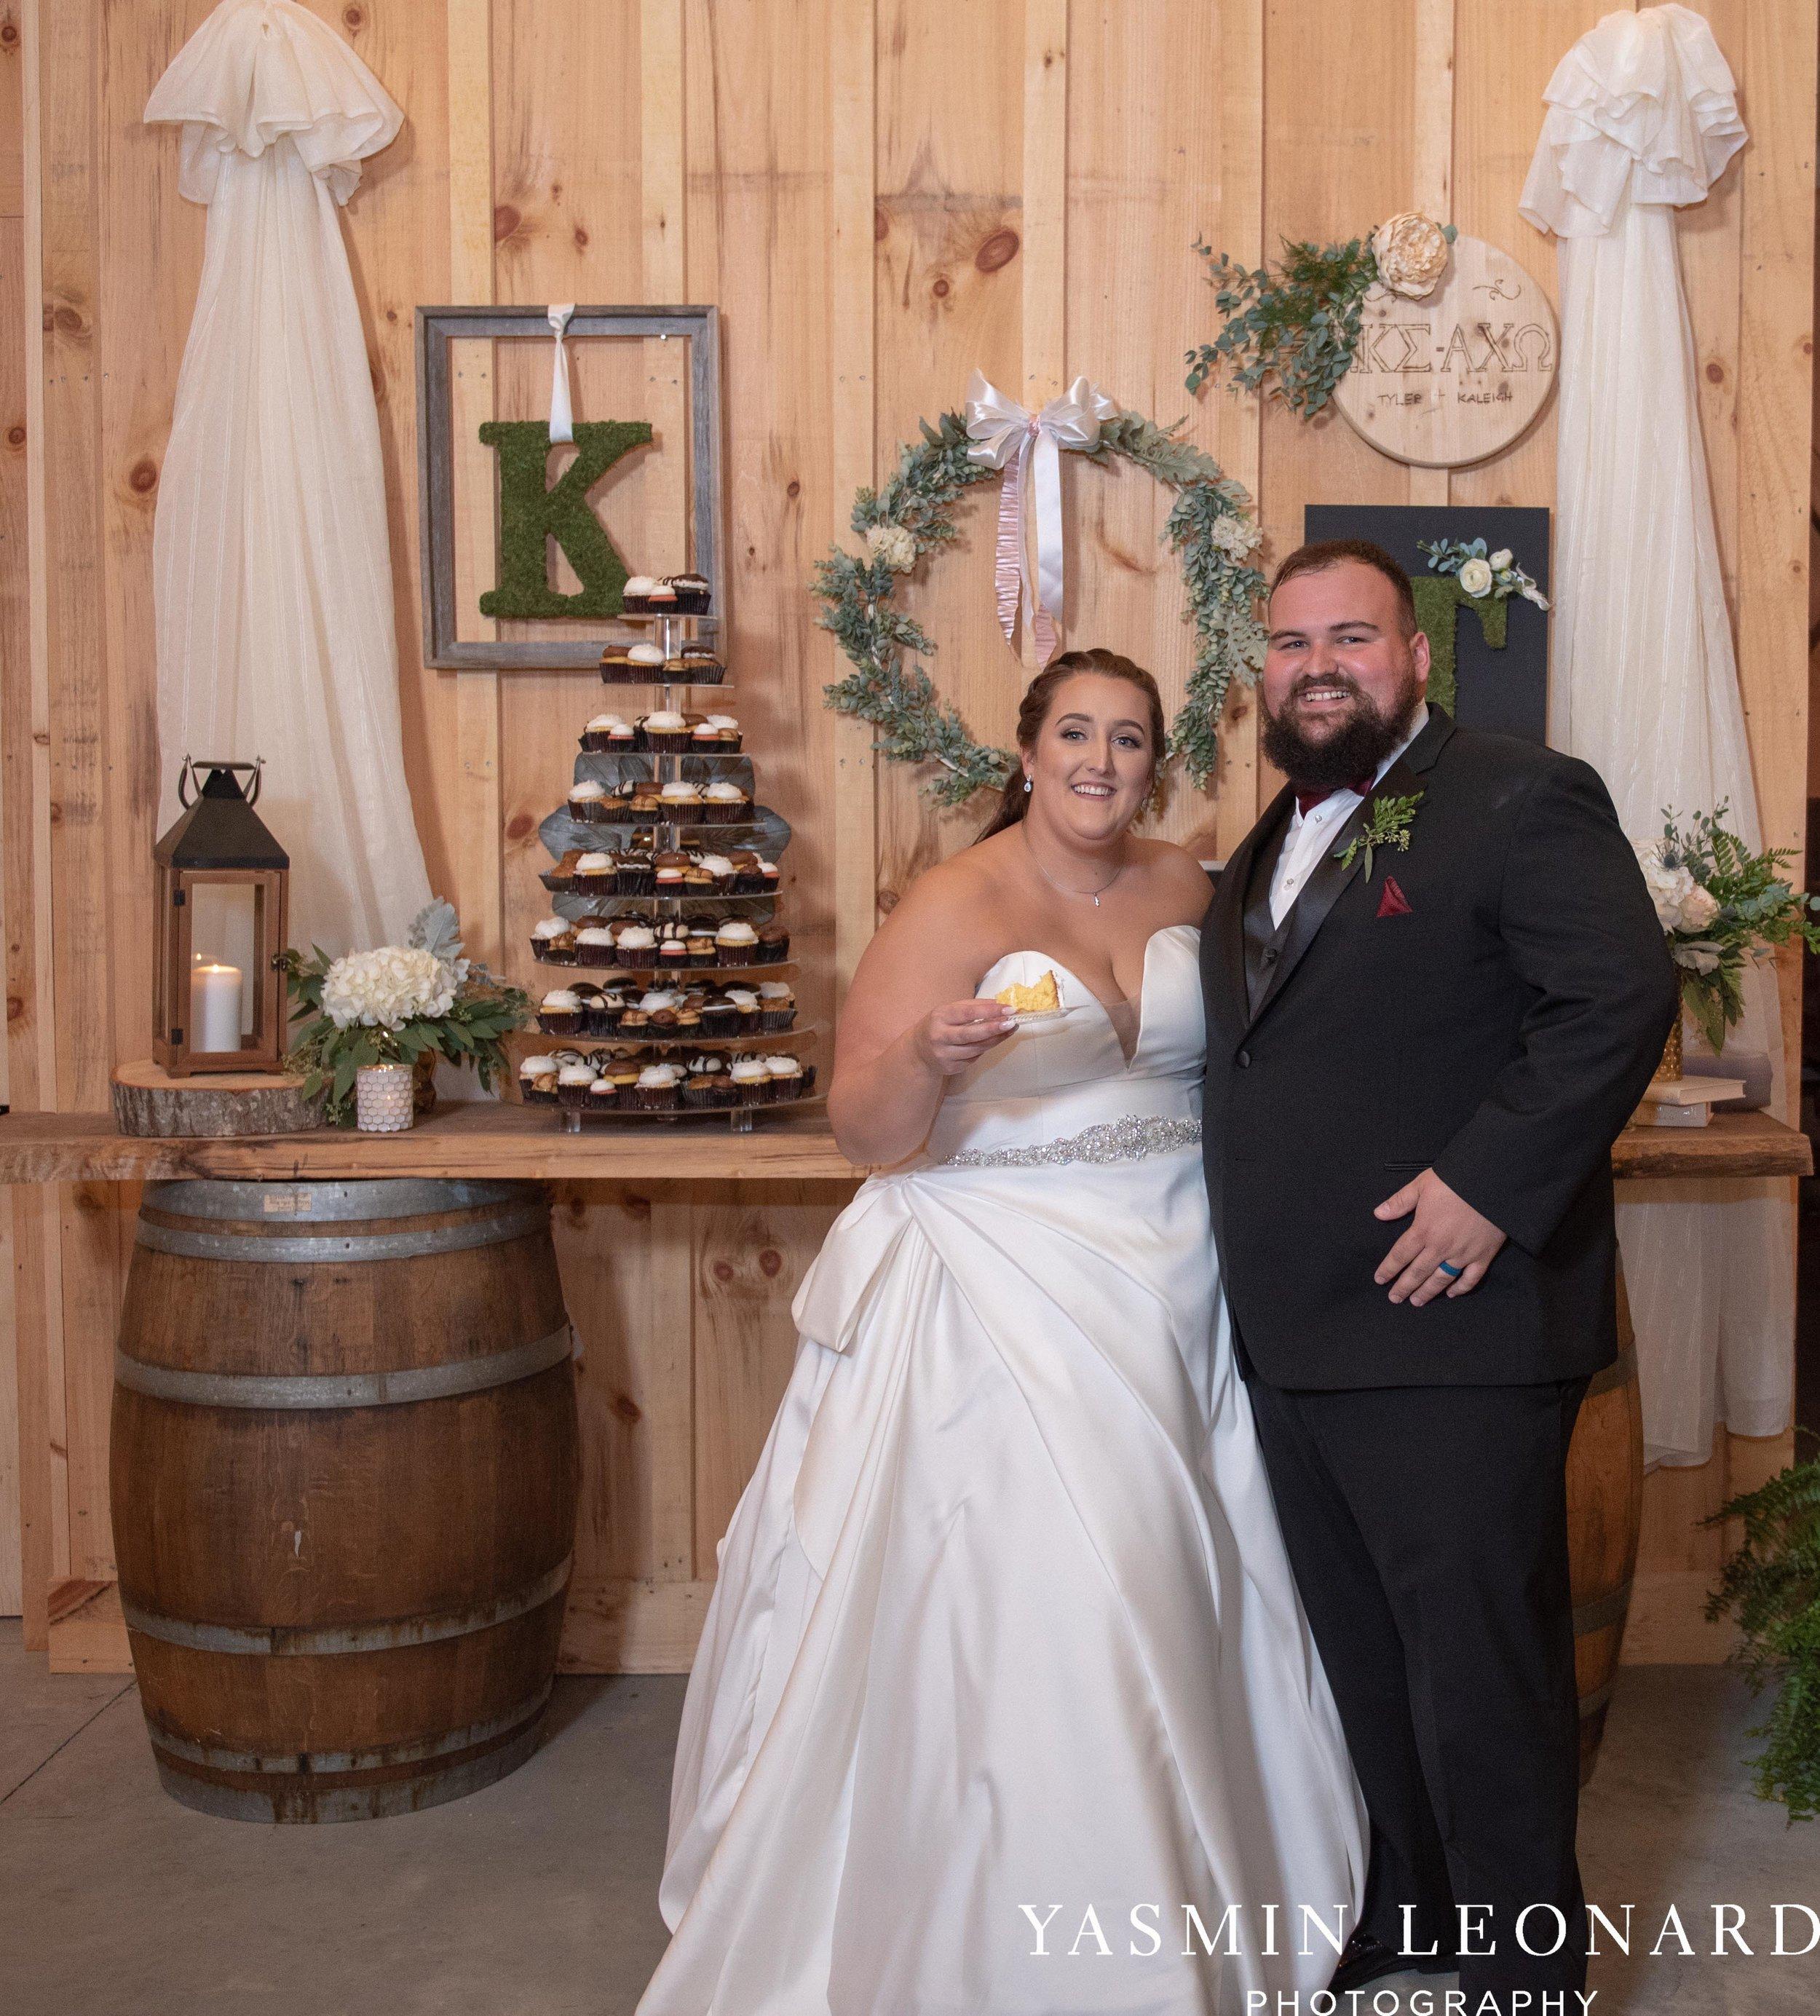 Wesley Memorial United Methodist Church - Old Homeplace Winery - High Point Weddings - High Point Wedding Photographer - NC Weddings - NC Barn Venue - Yasmin Leonard Photography-70.jpg